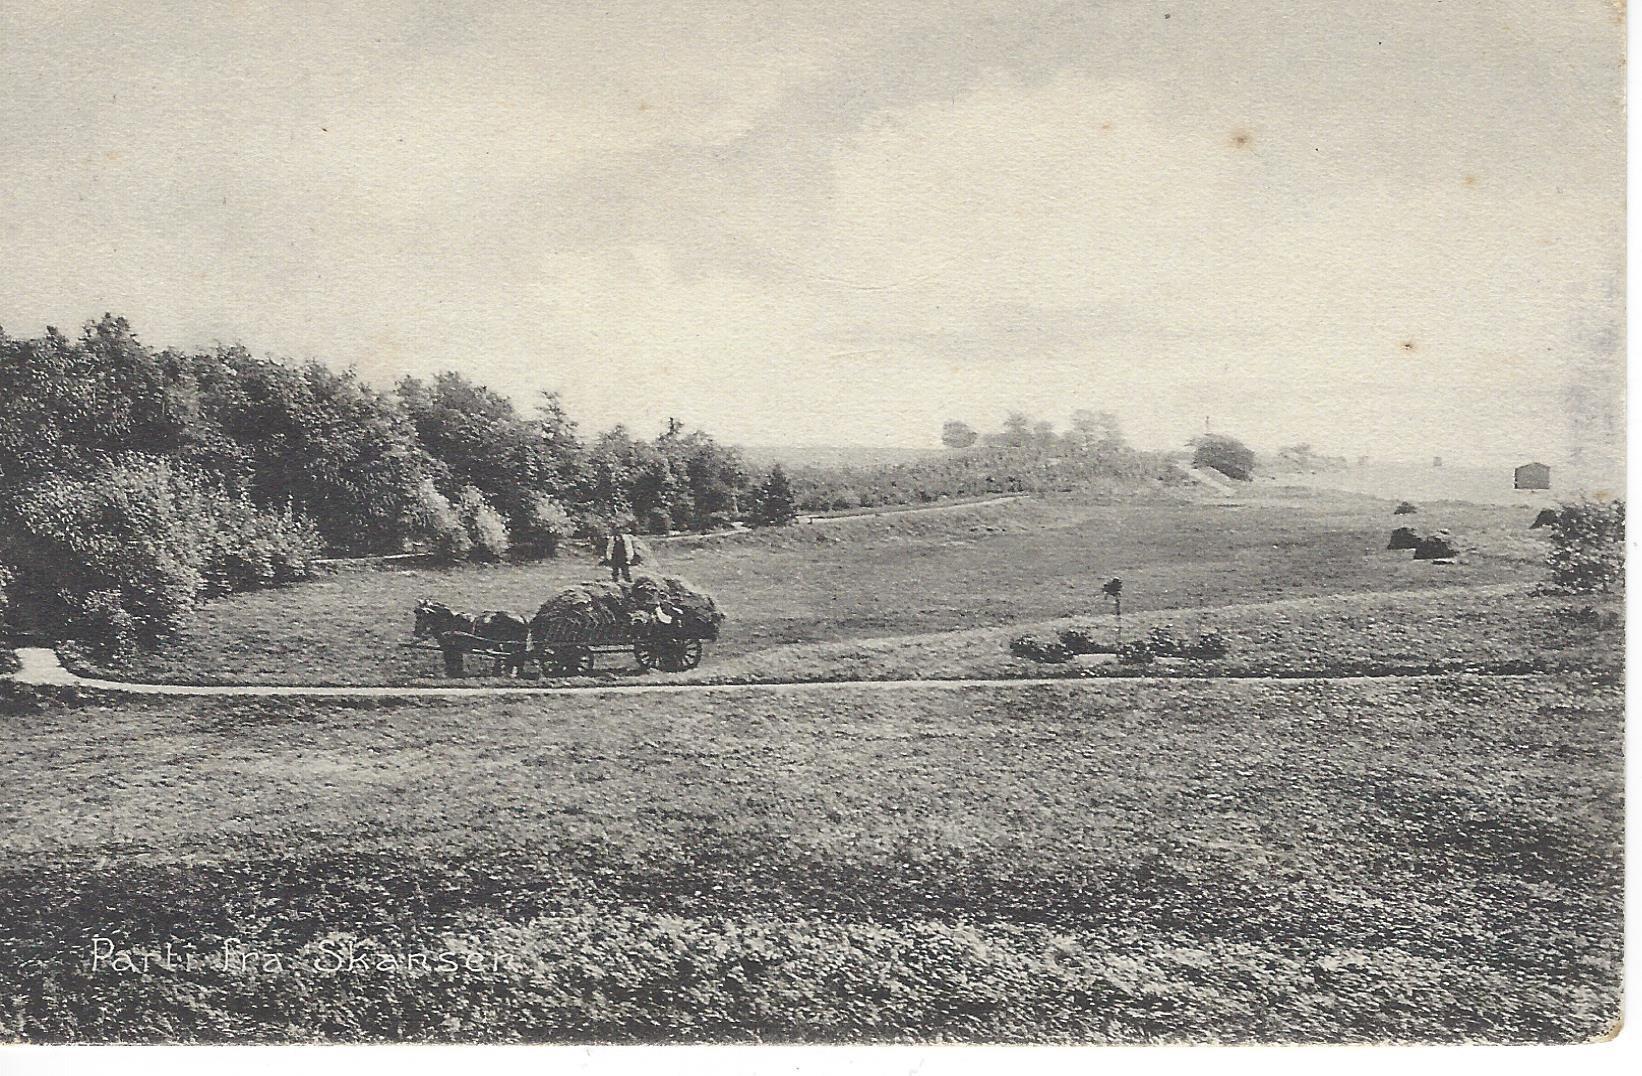 02-Skanseanlægget-1906